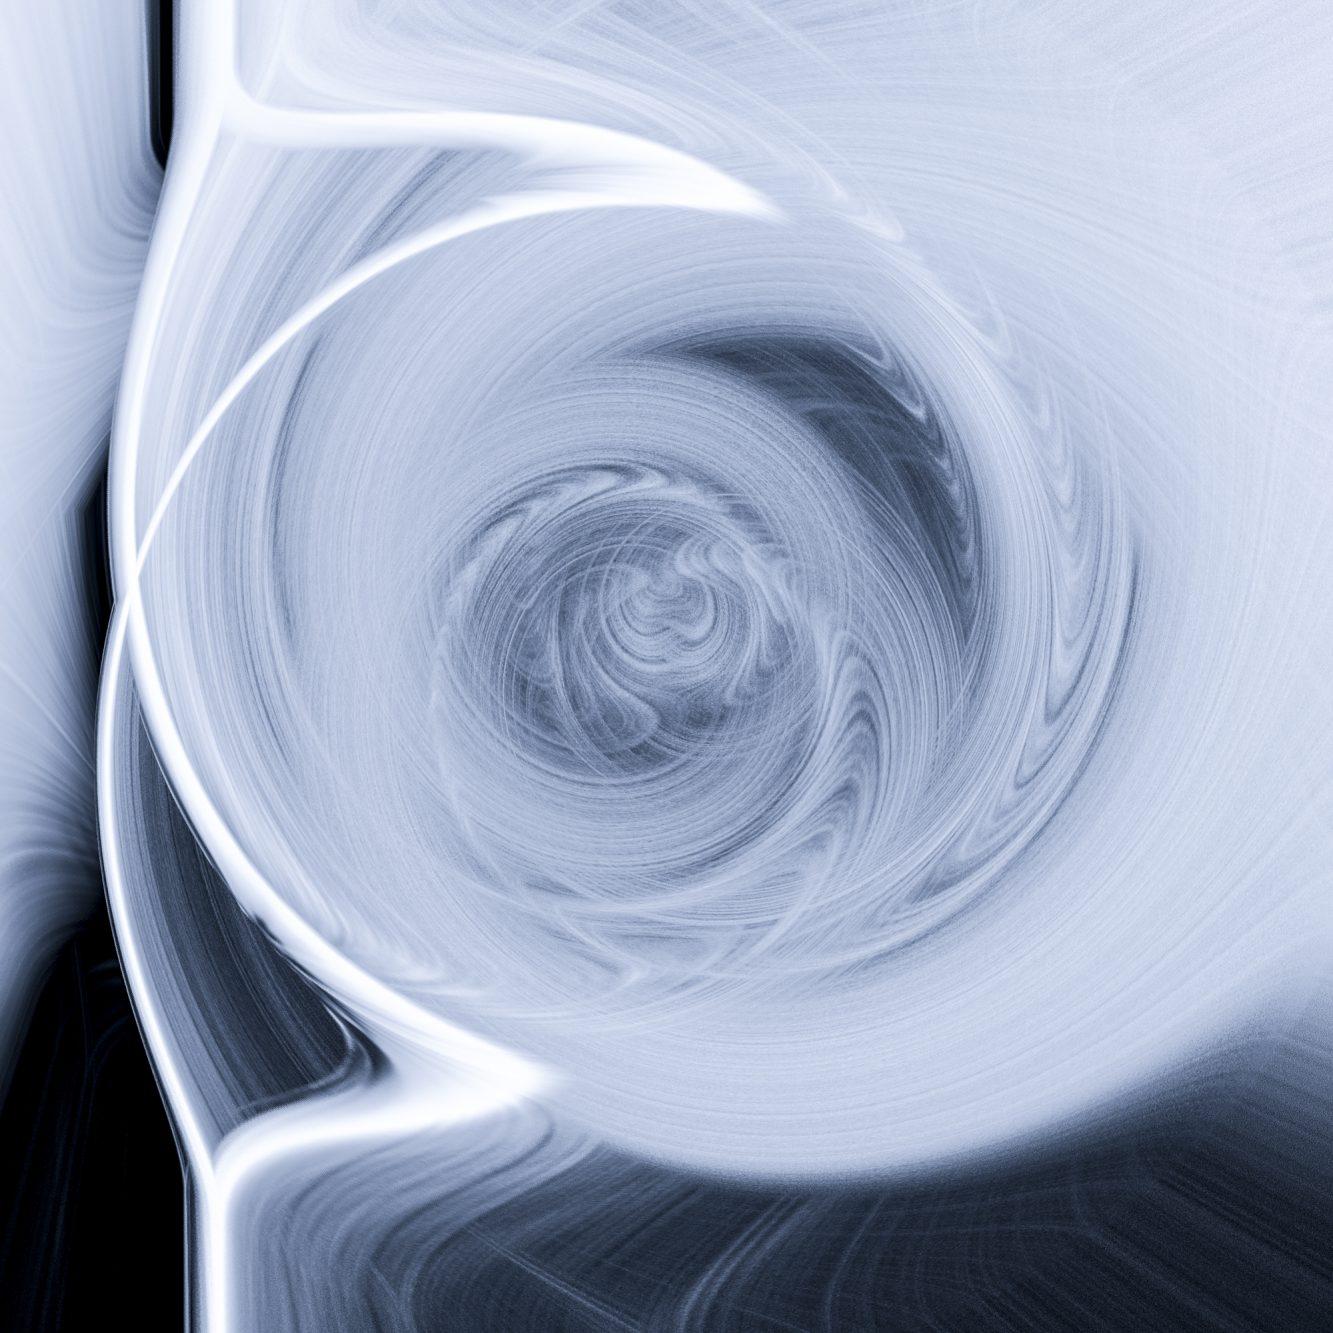 glass-photo-art-5651-bewerkt